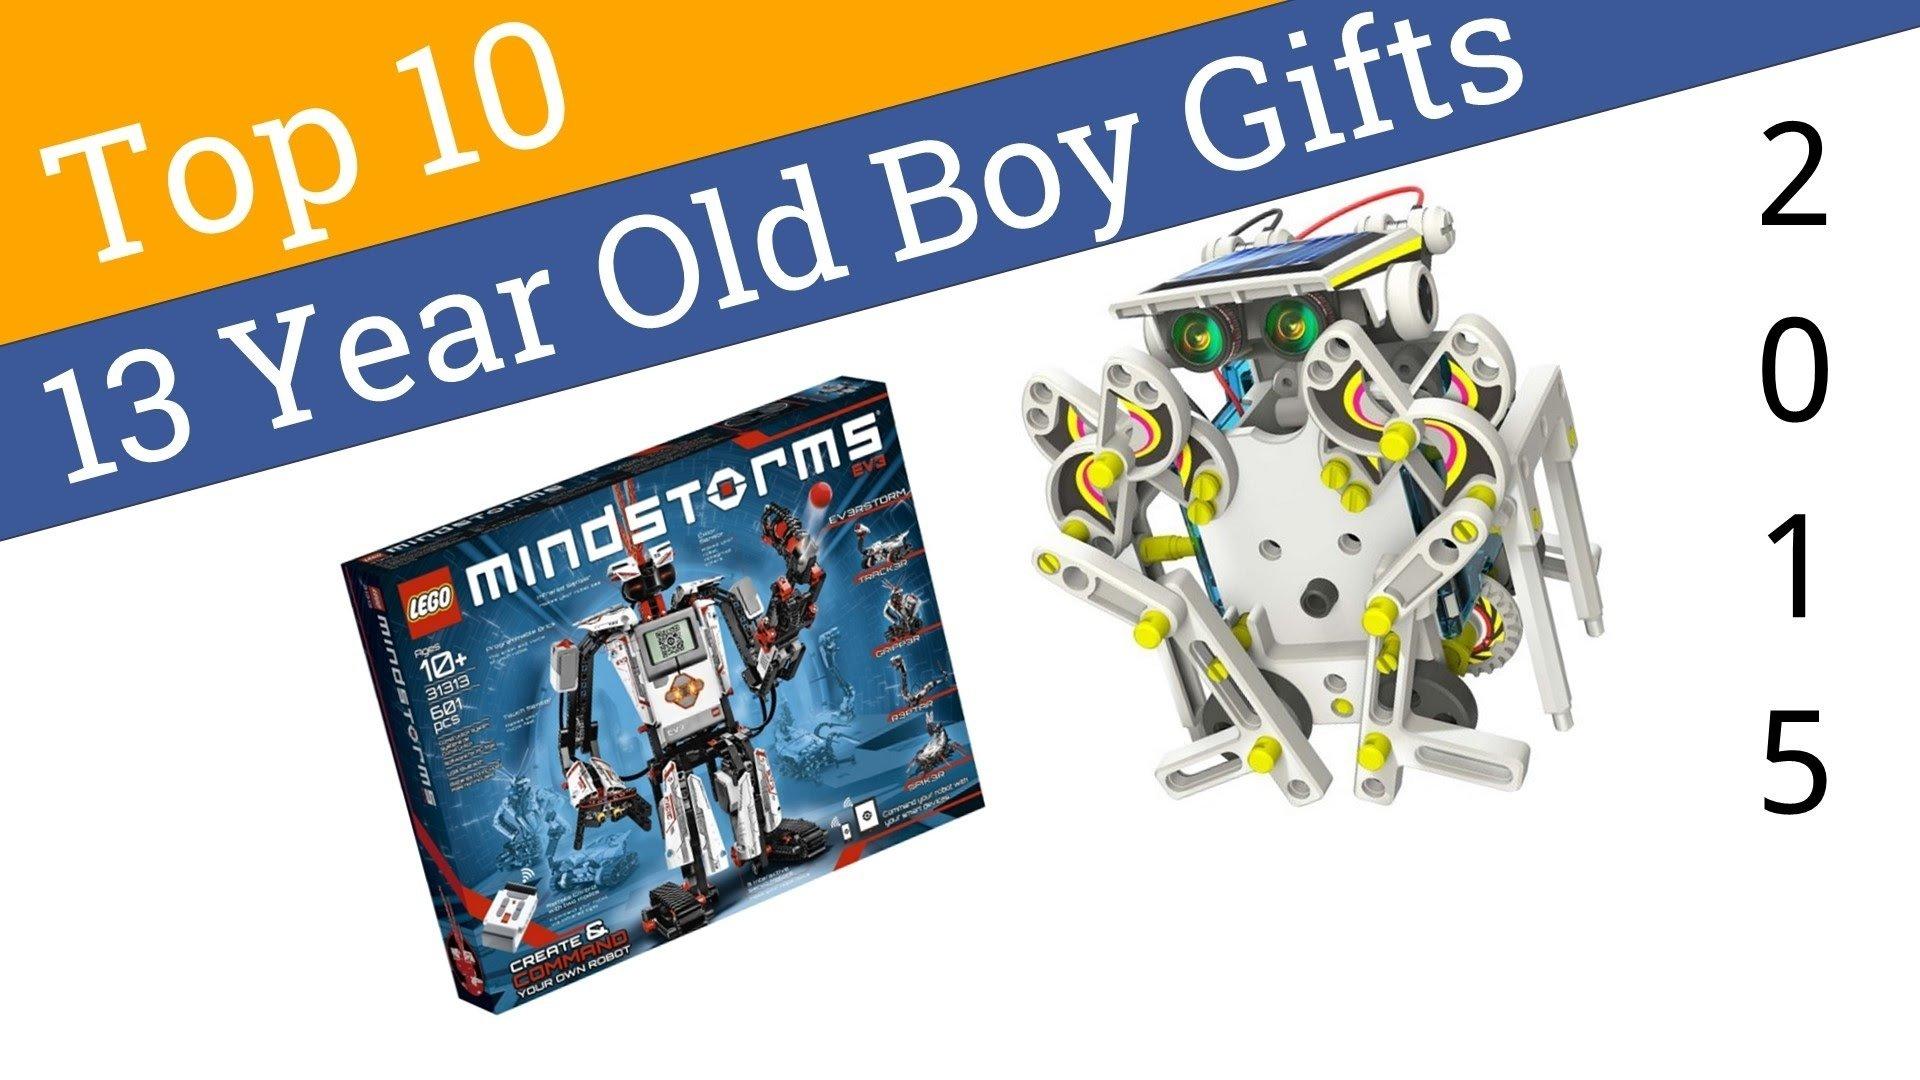 10 Elegant 13 Year Old Boy Gift Ideas 10 best 13 year old boy gifts 2015 youtube 3